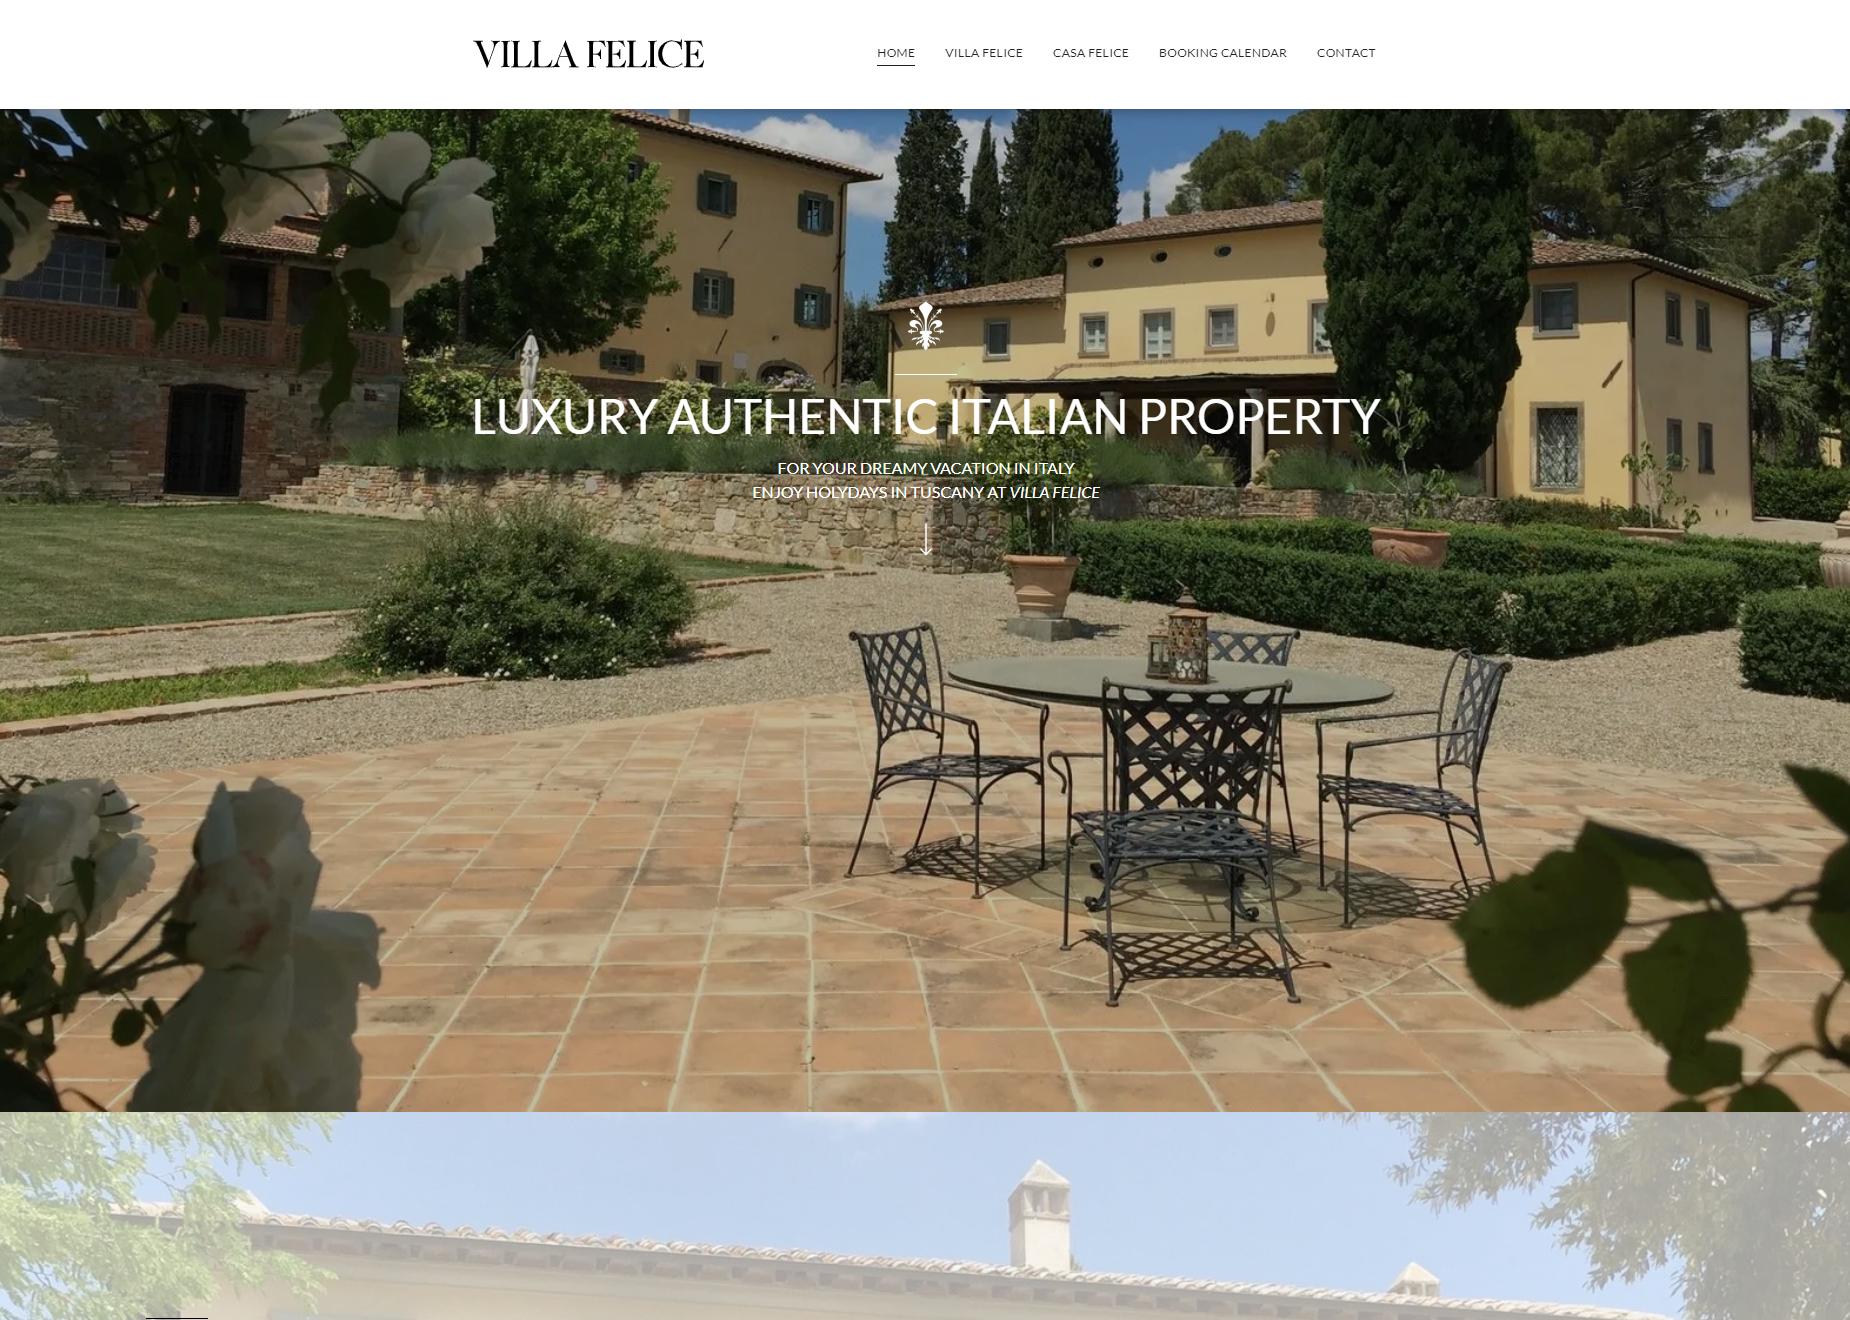 screencapture-villa-felice-it-2020-02-20-17_03_19 (1)